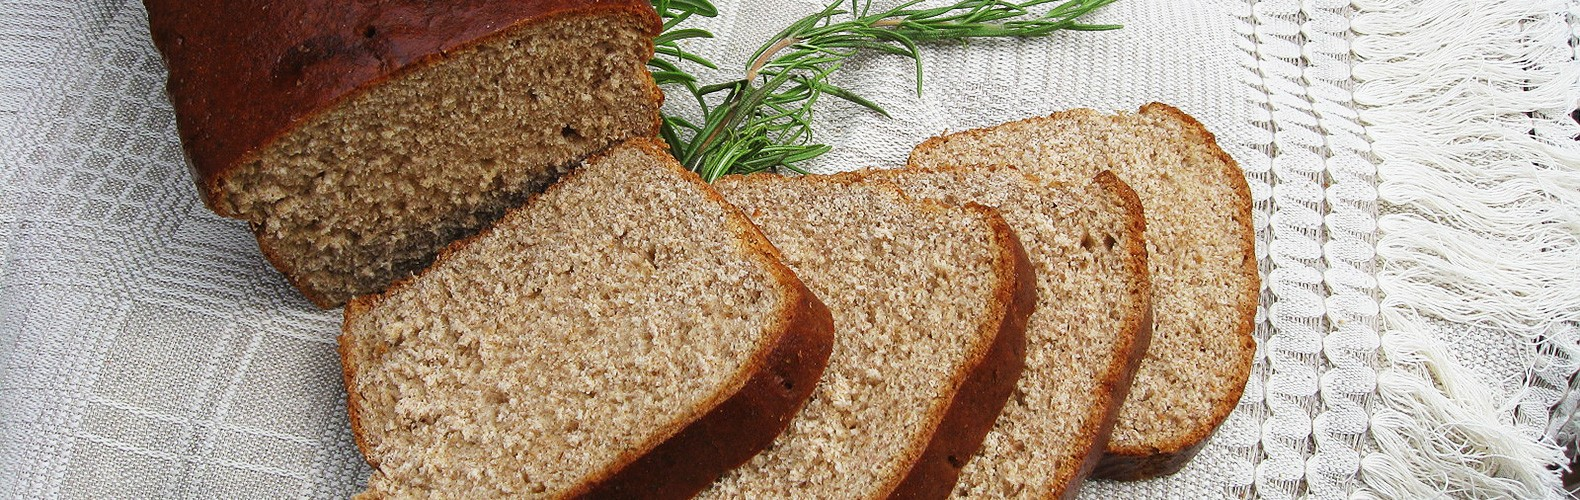 Supjaustyta duona | Kernavės bajorynė